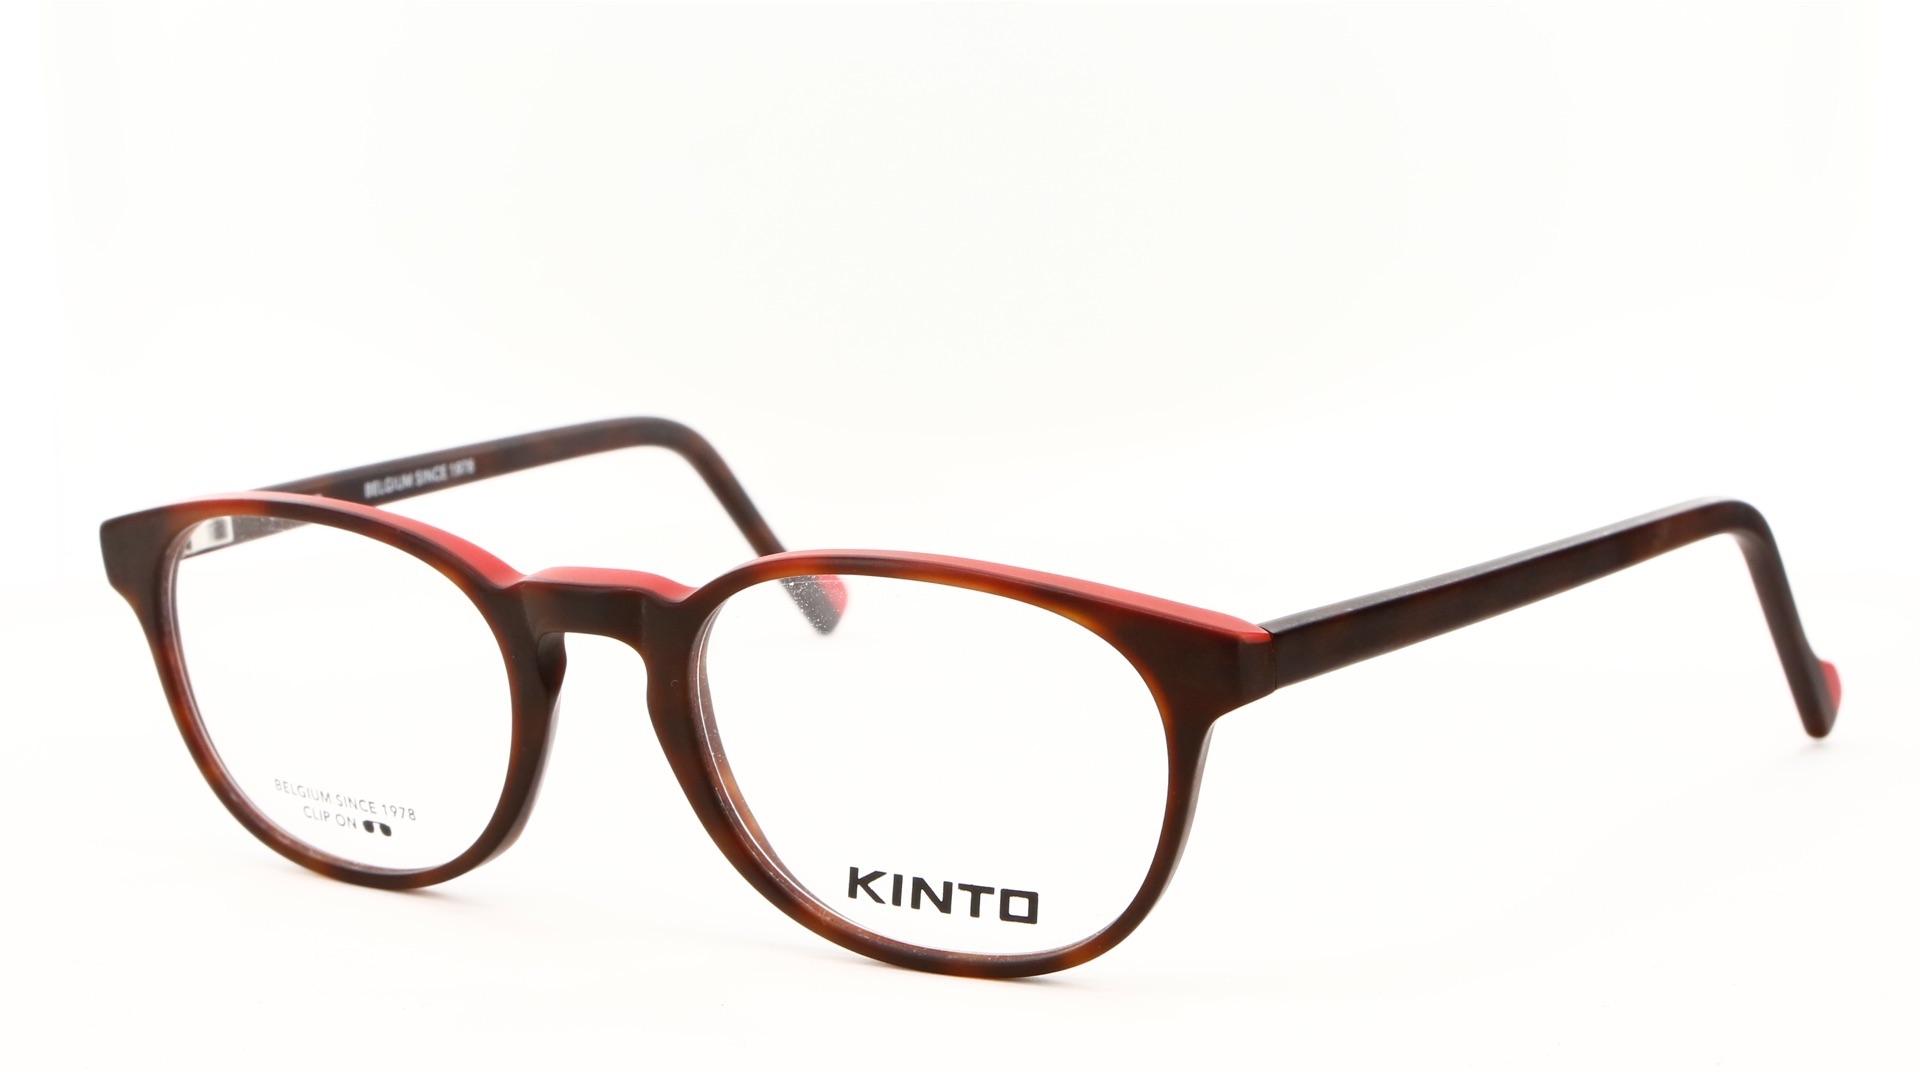 Kinto - ref: 78688